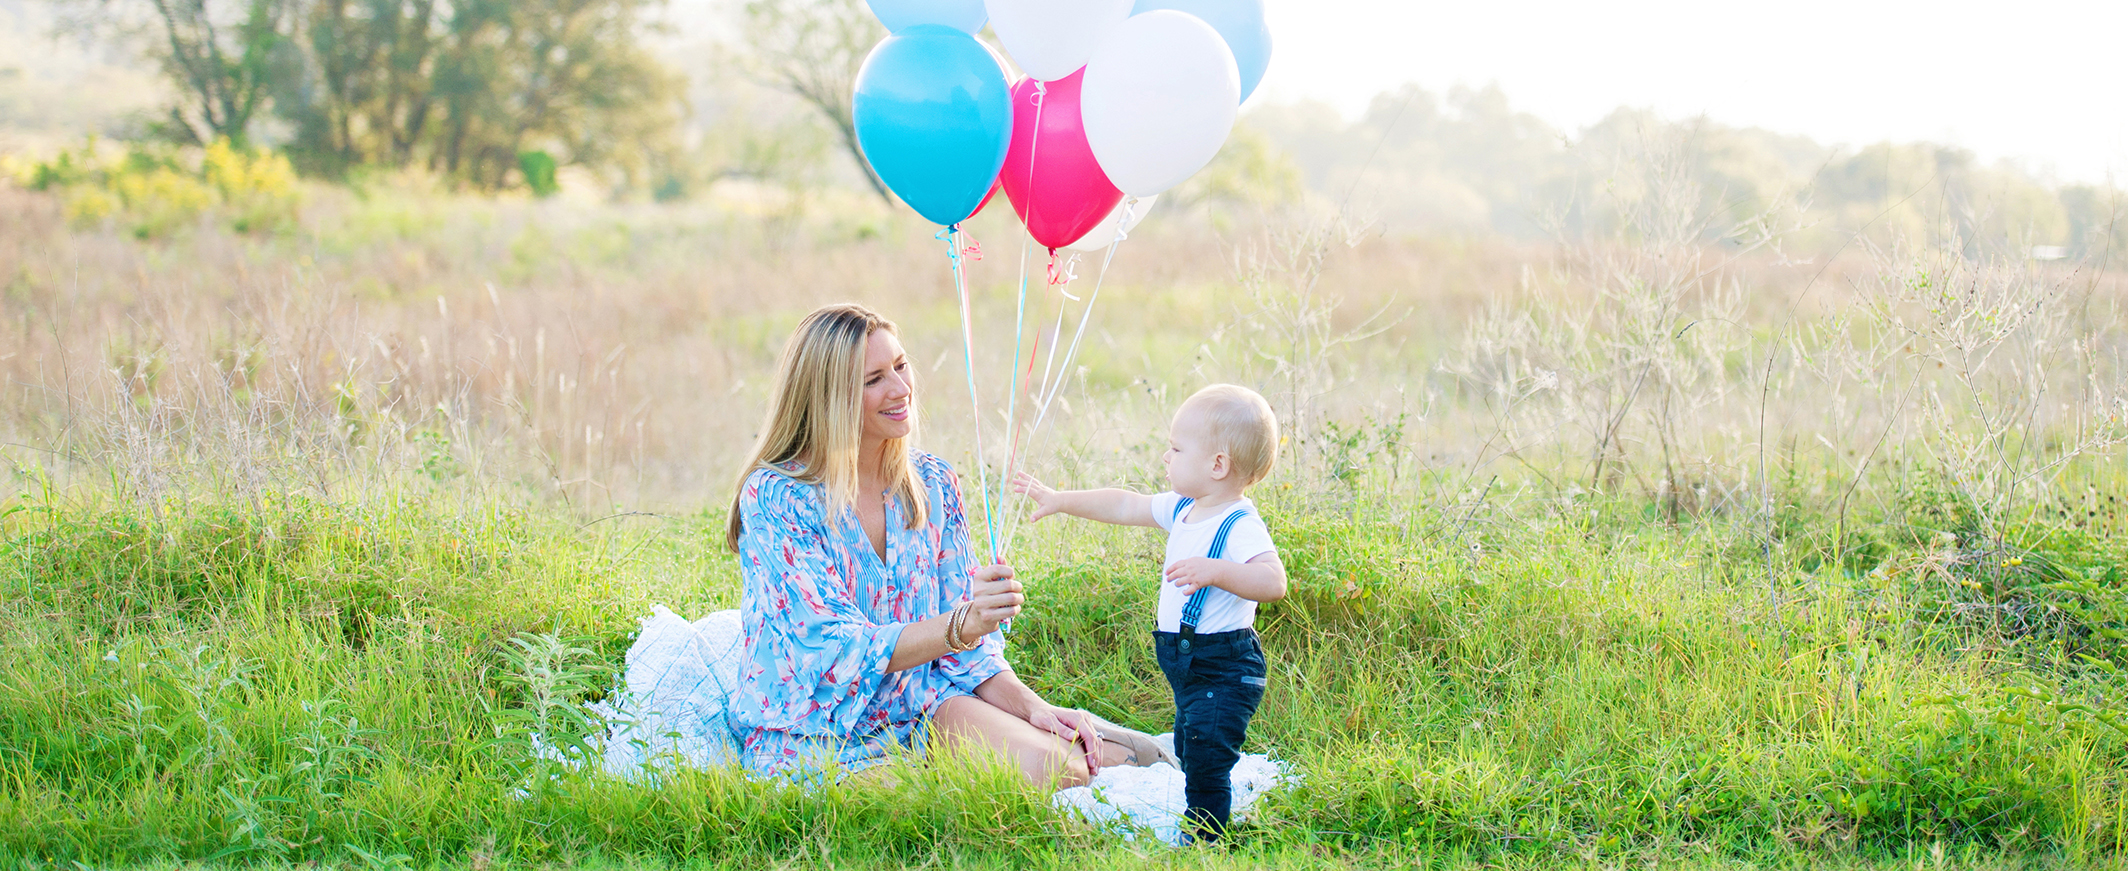 austin birthday newborn family lifestyle photographer ziem photography Bancroft